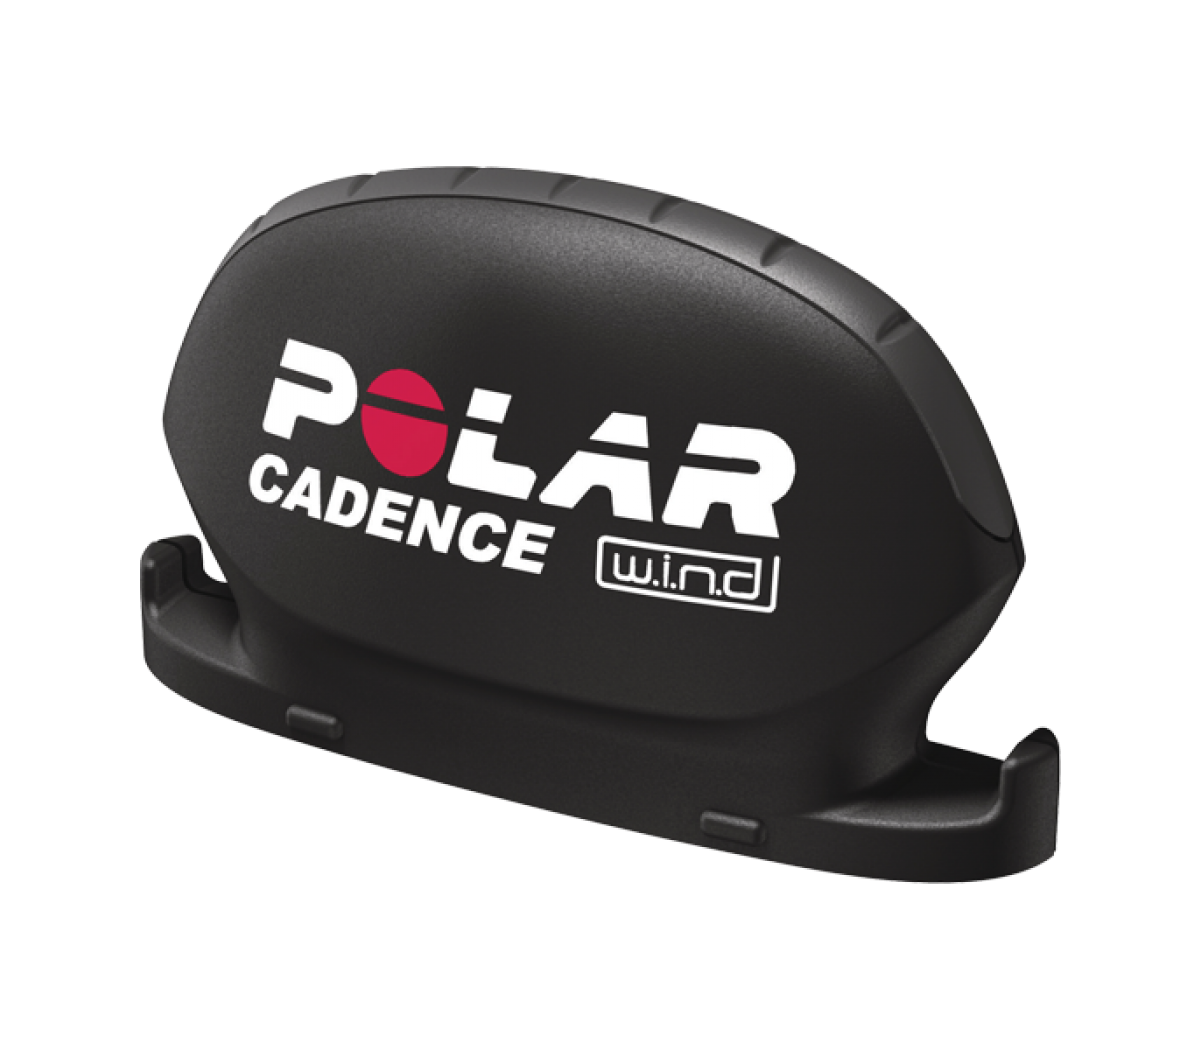 Polar CS cadanssensor W.I.N.D.